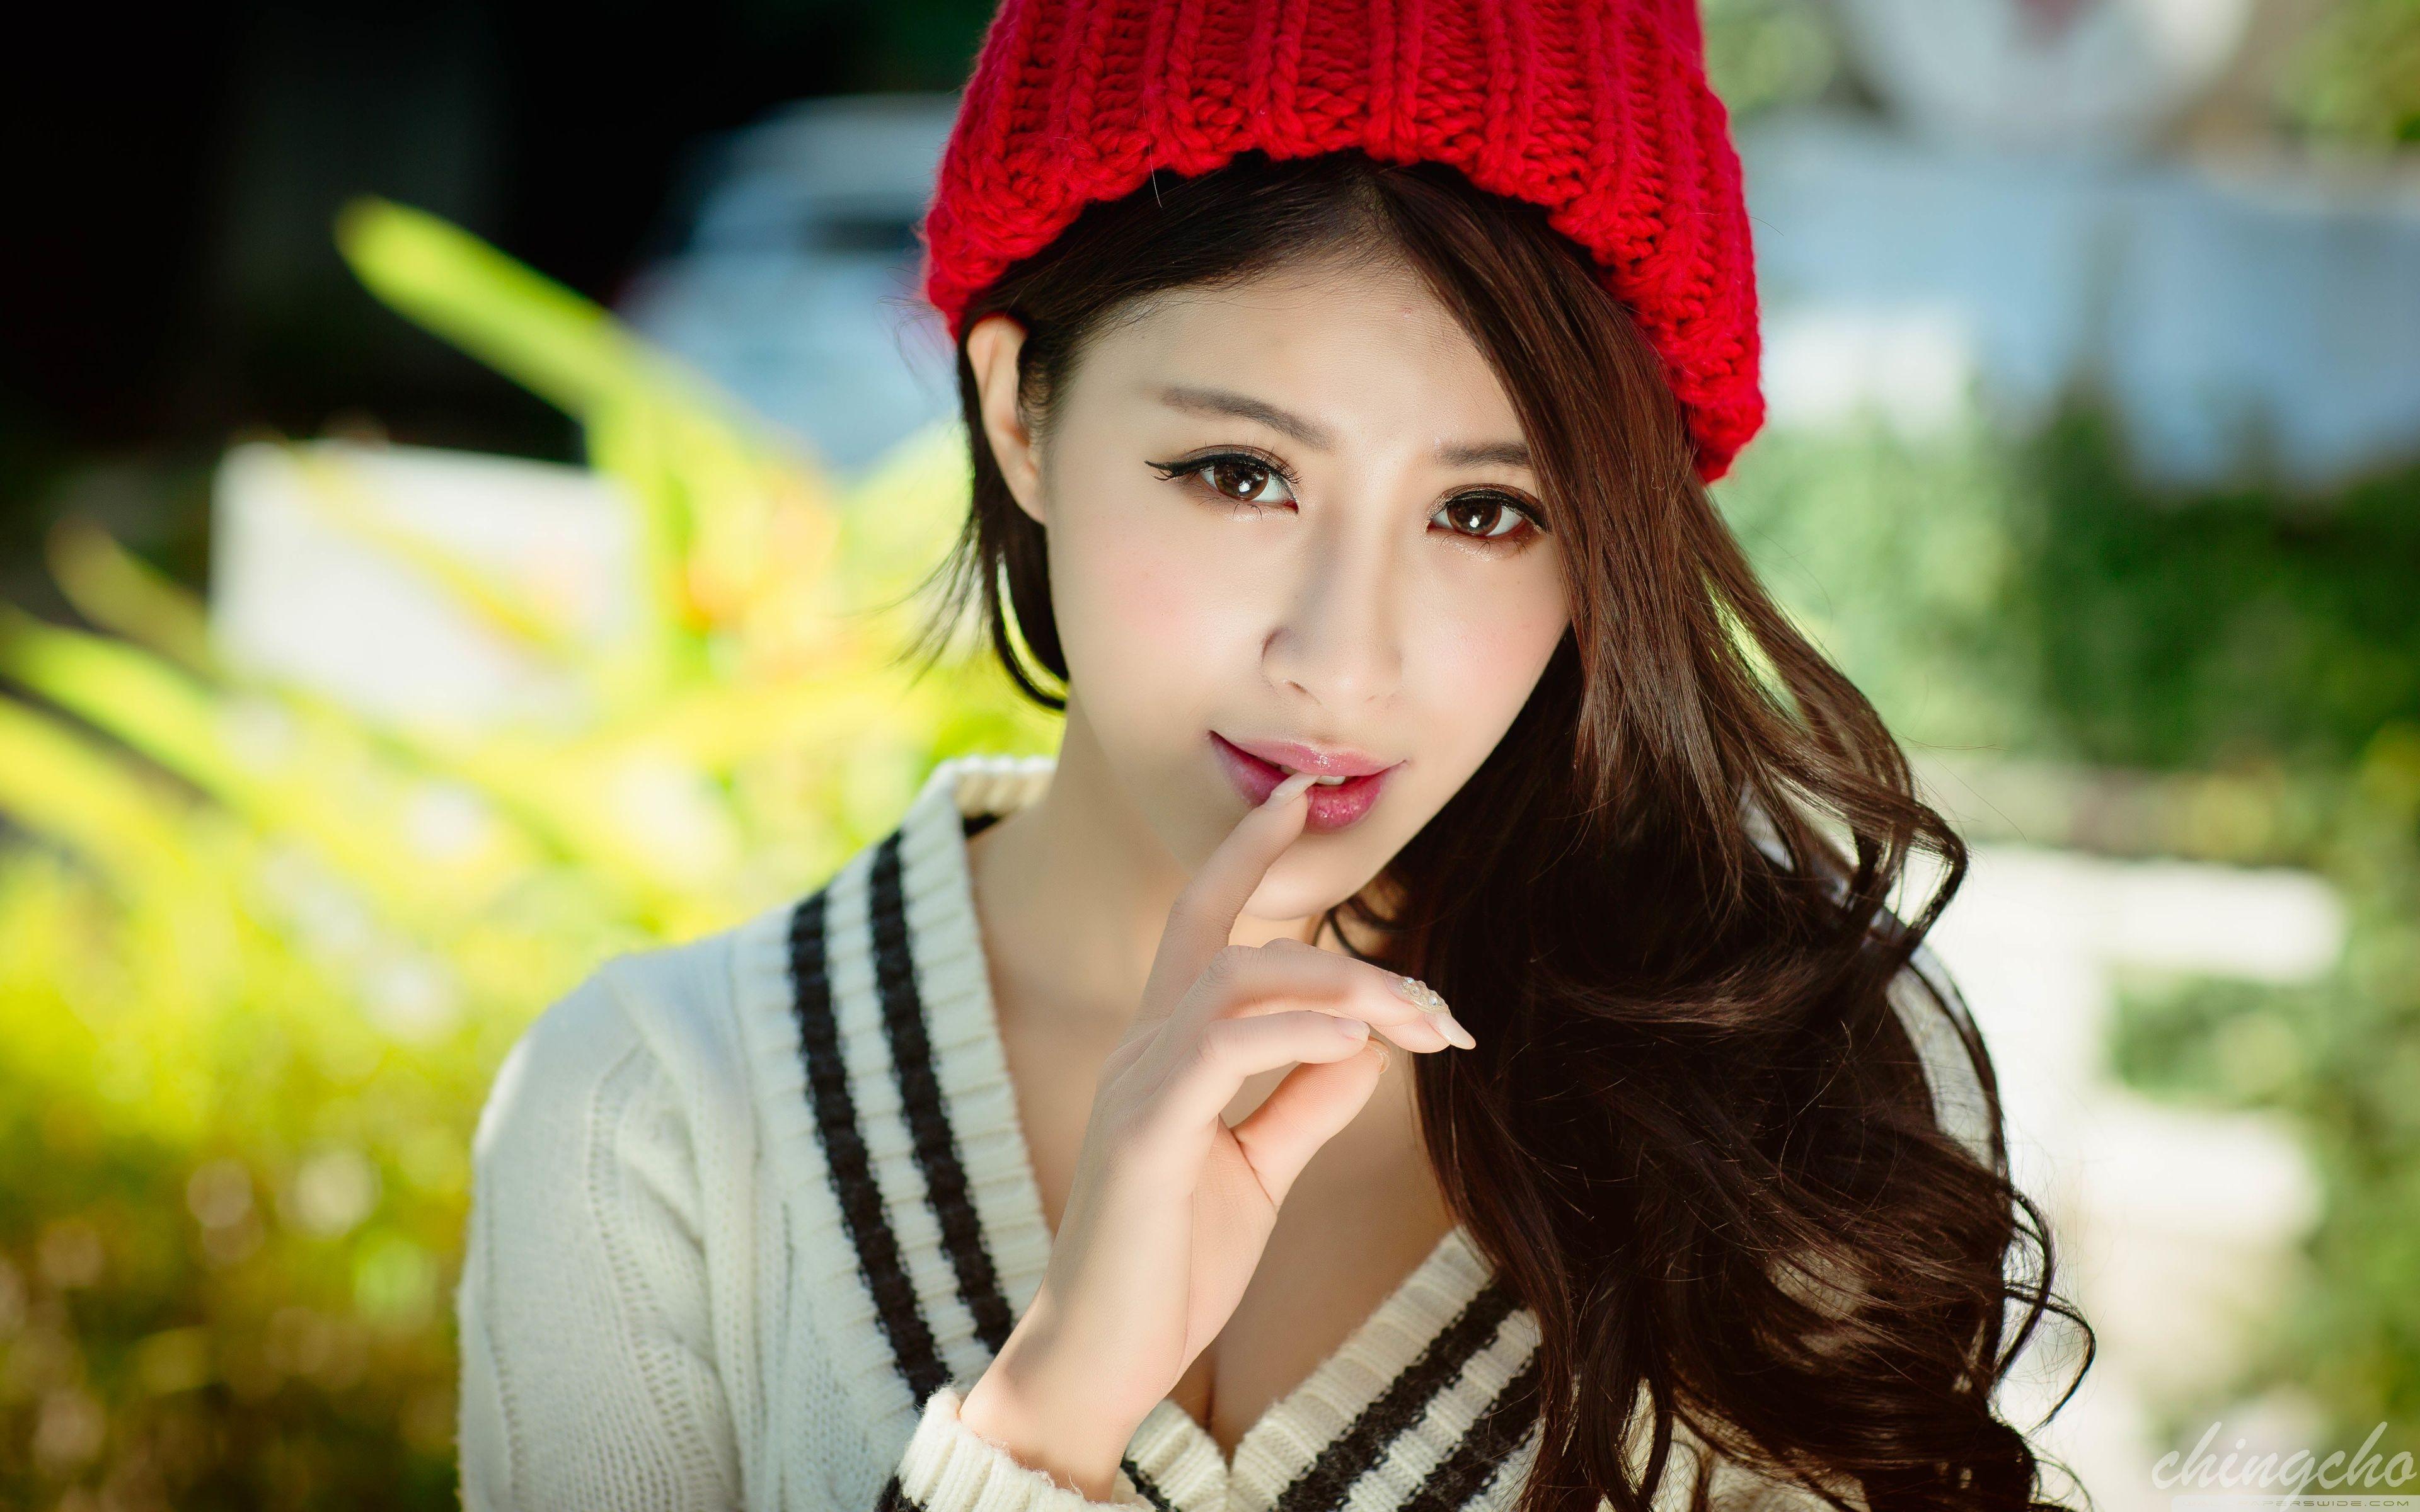 China Girl Photo Wallpapers - Wallpaper Cave